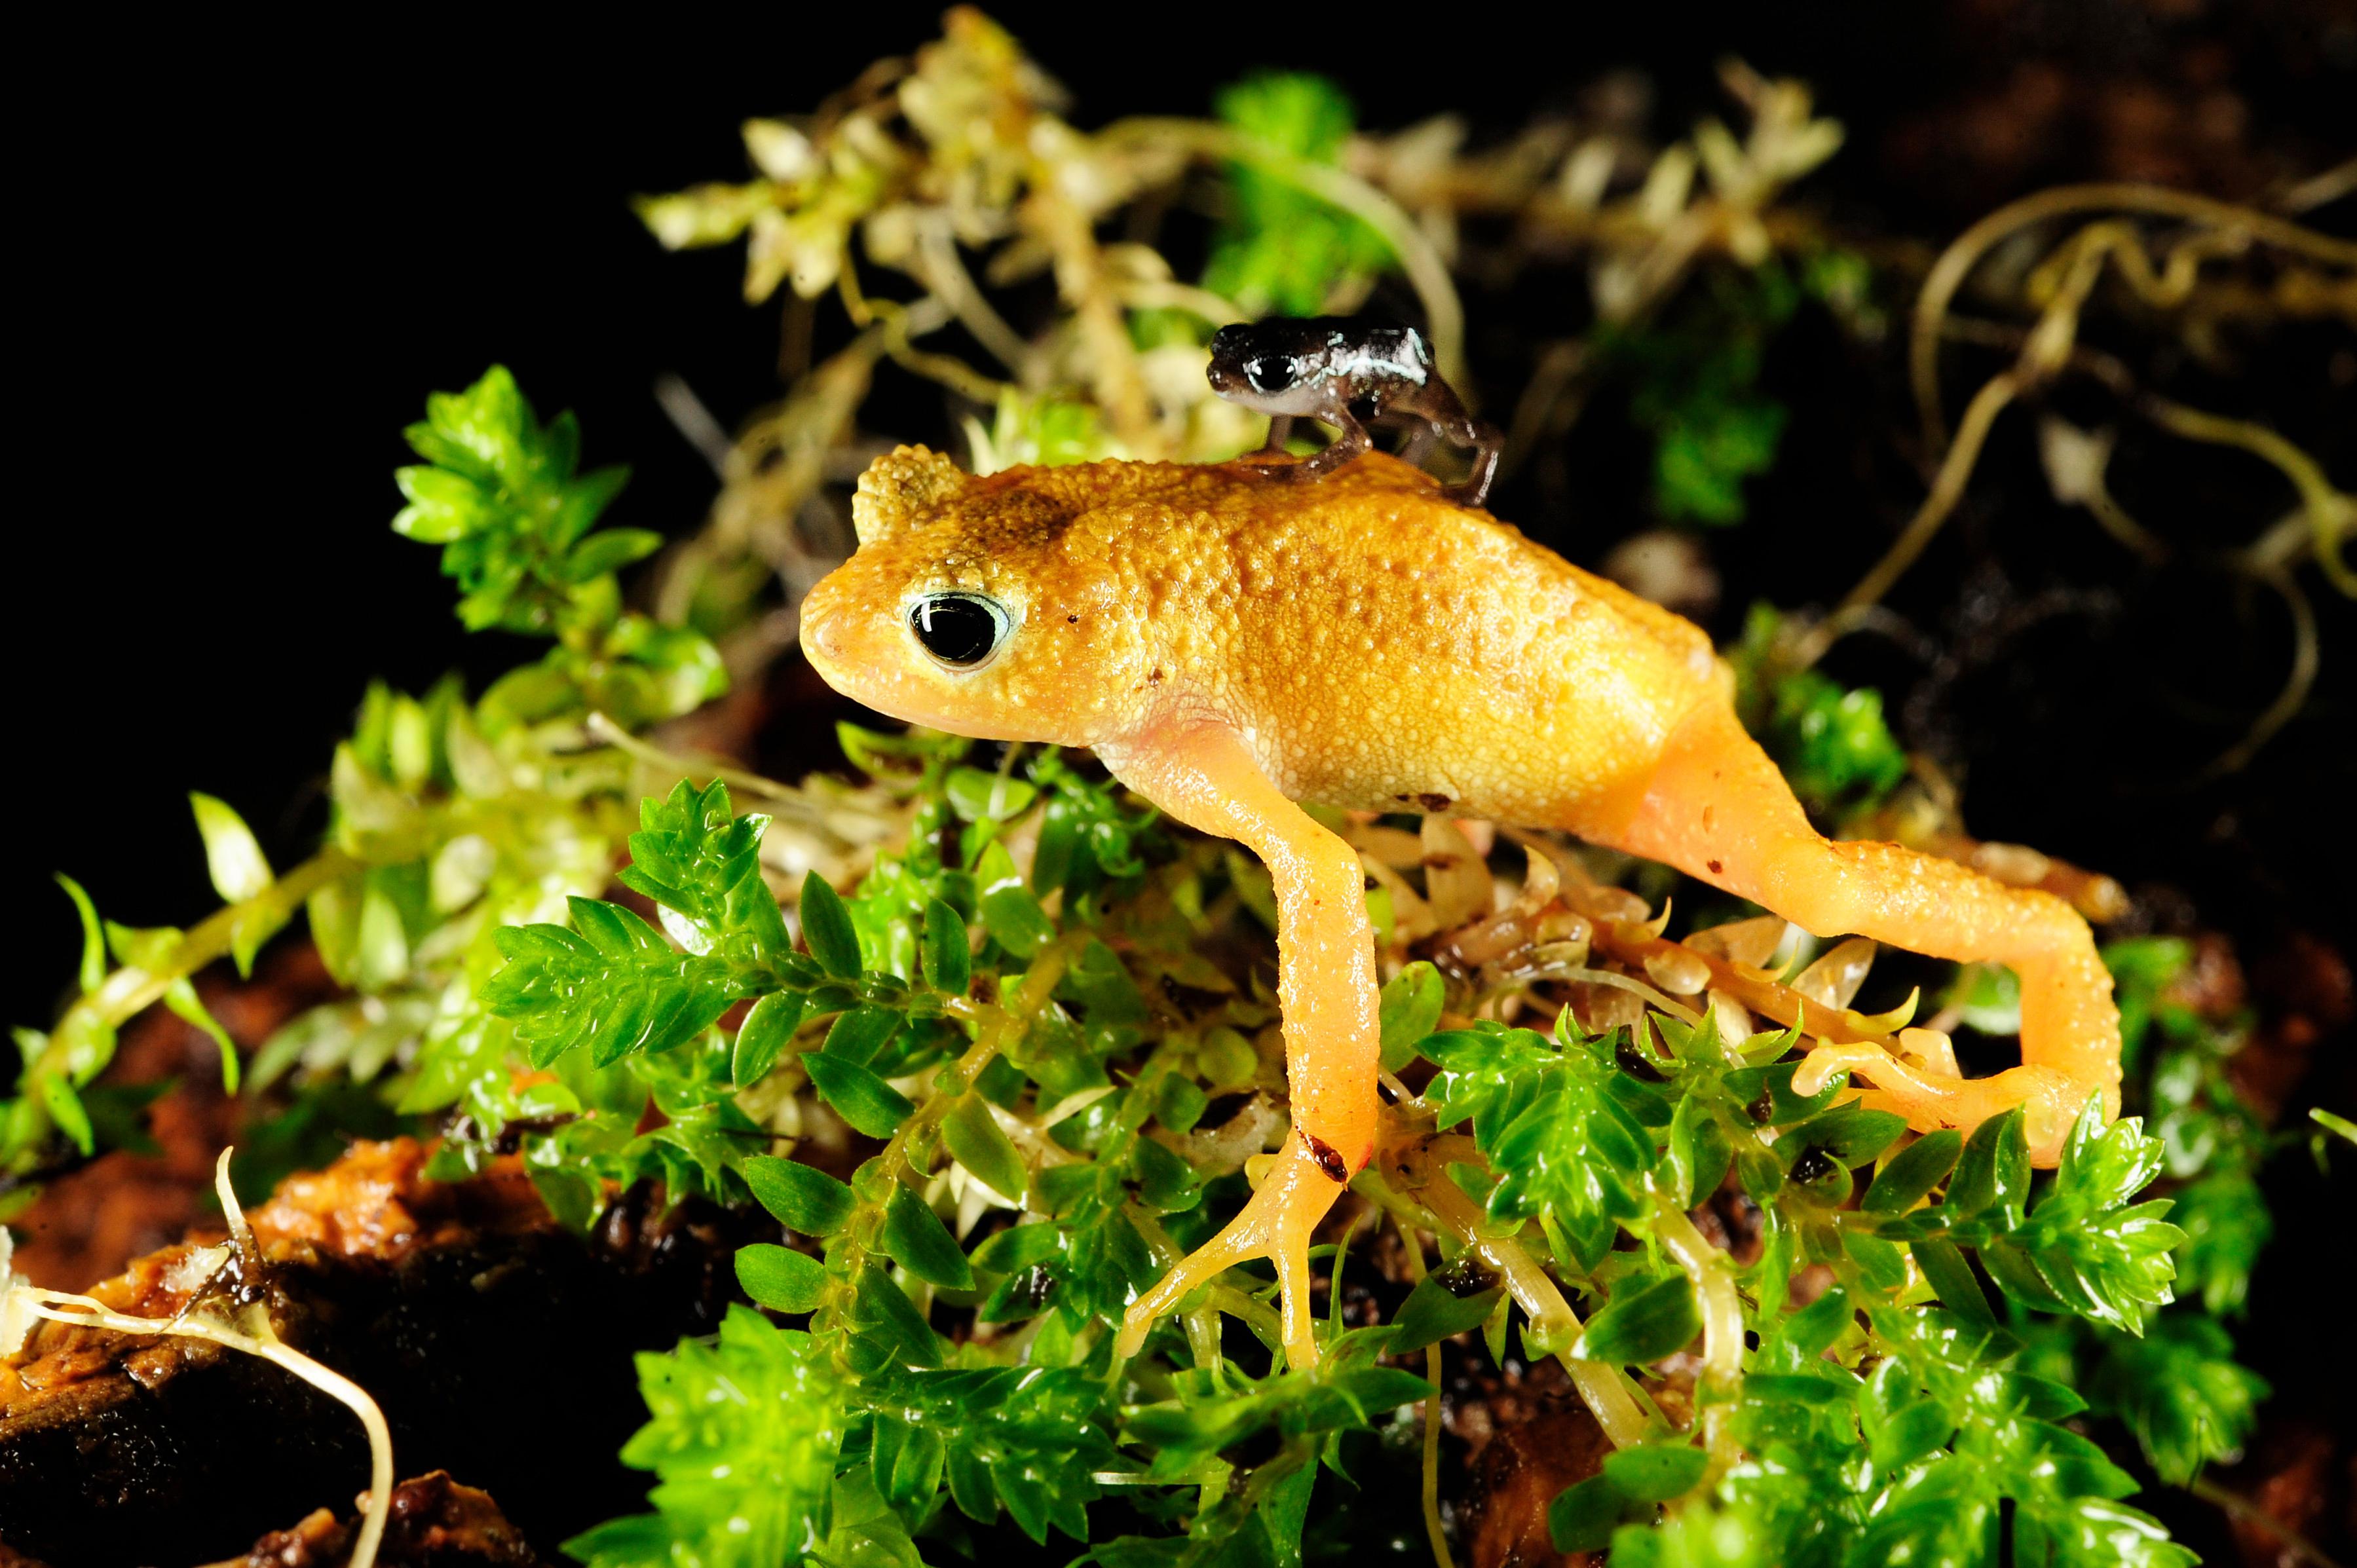 Menu for a Tiny Toad